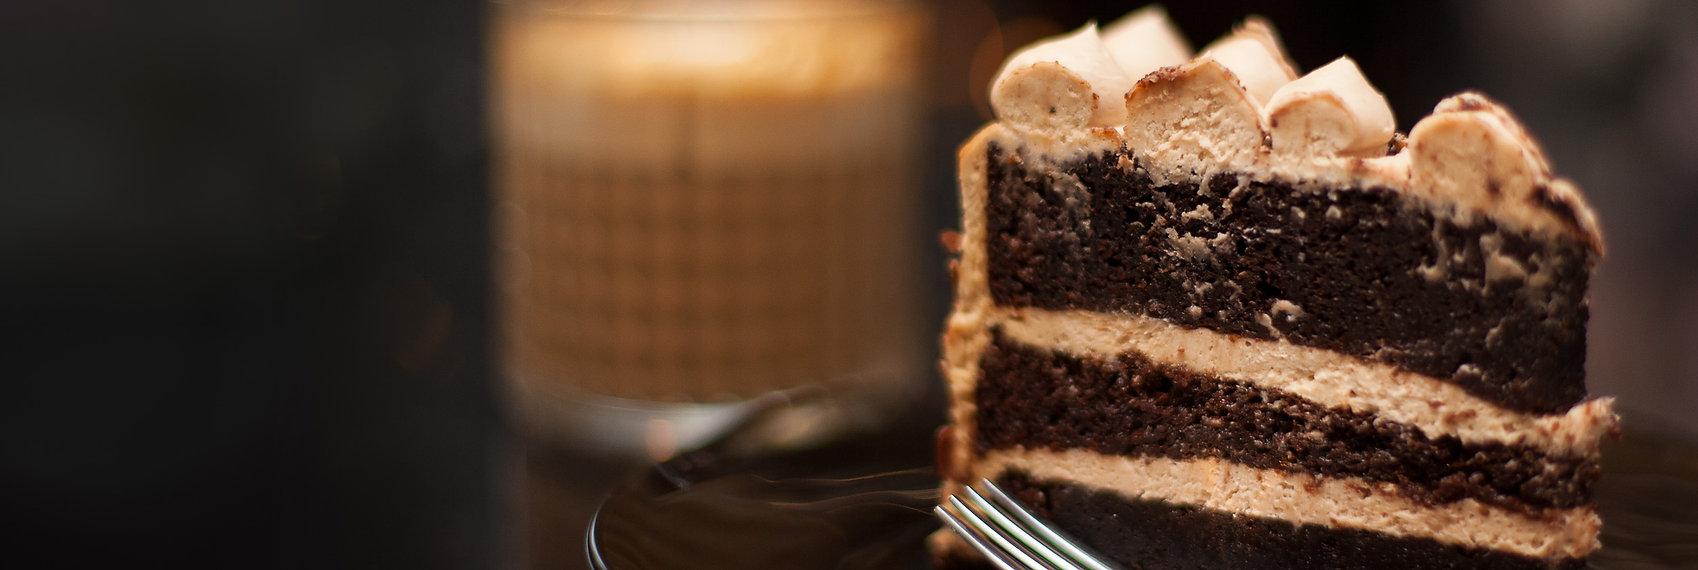 Elsas-cafe-top.jpg